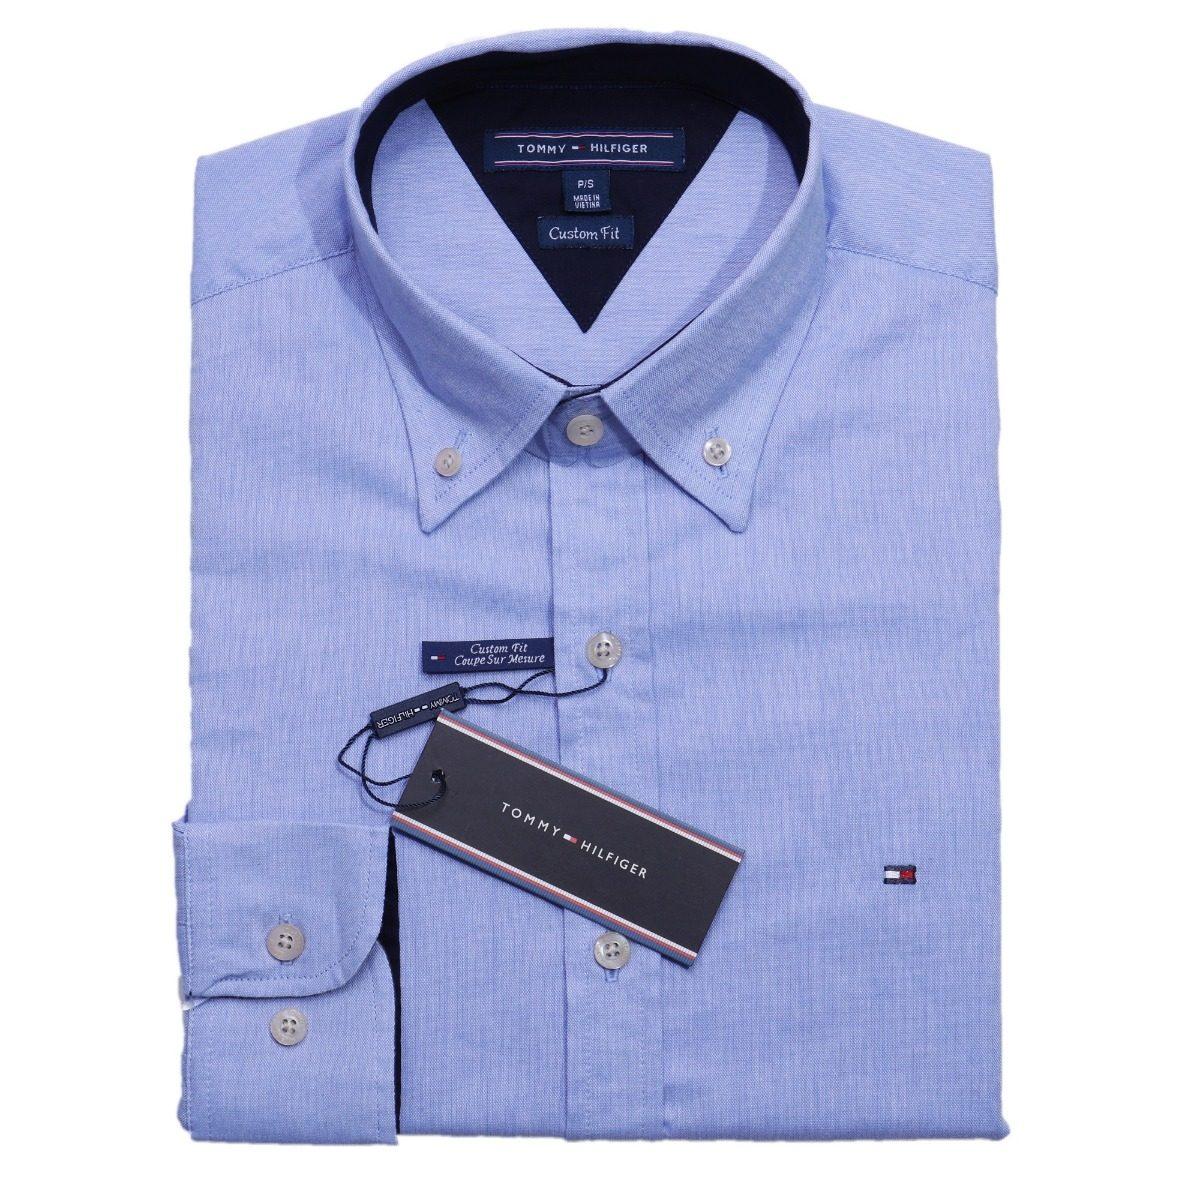 camisa social tommy hilfiger masc azul custom fit original. Carregando zoom. 312053f35c41b